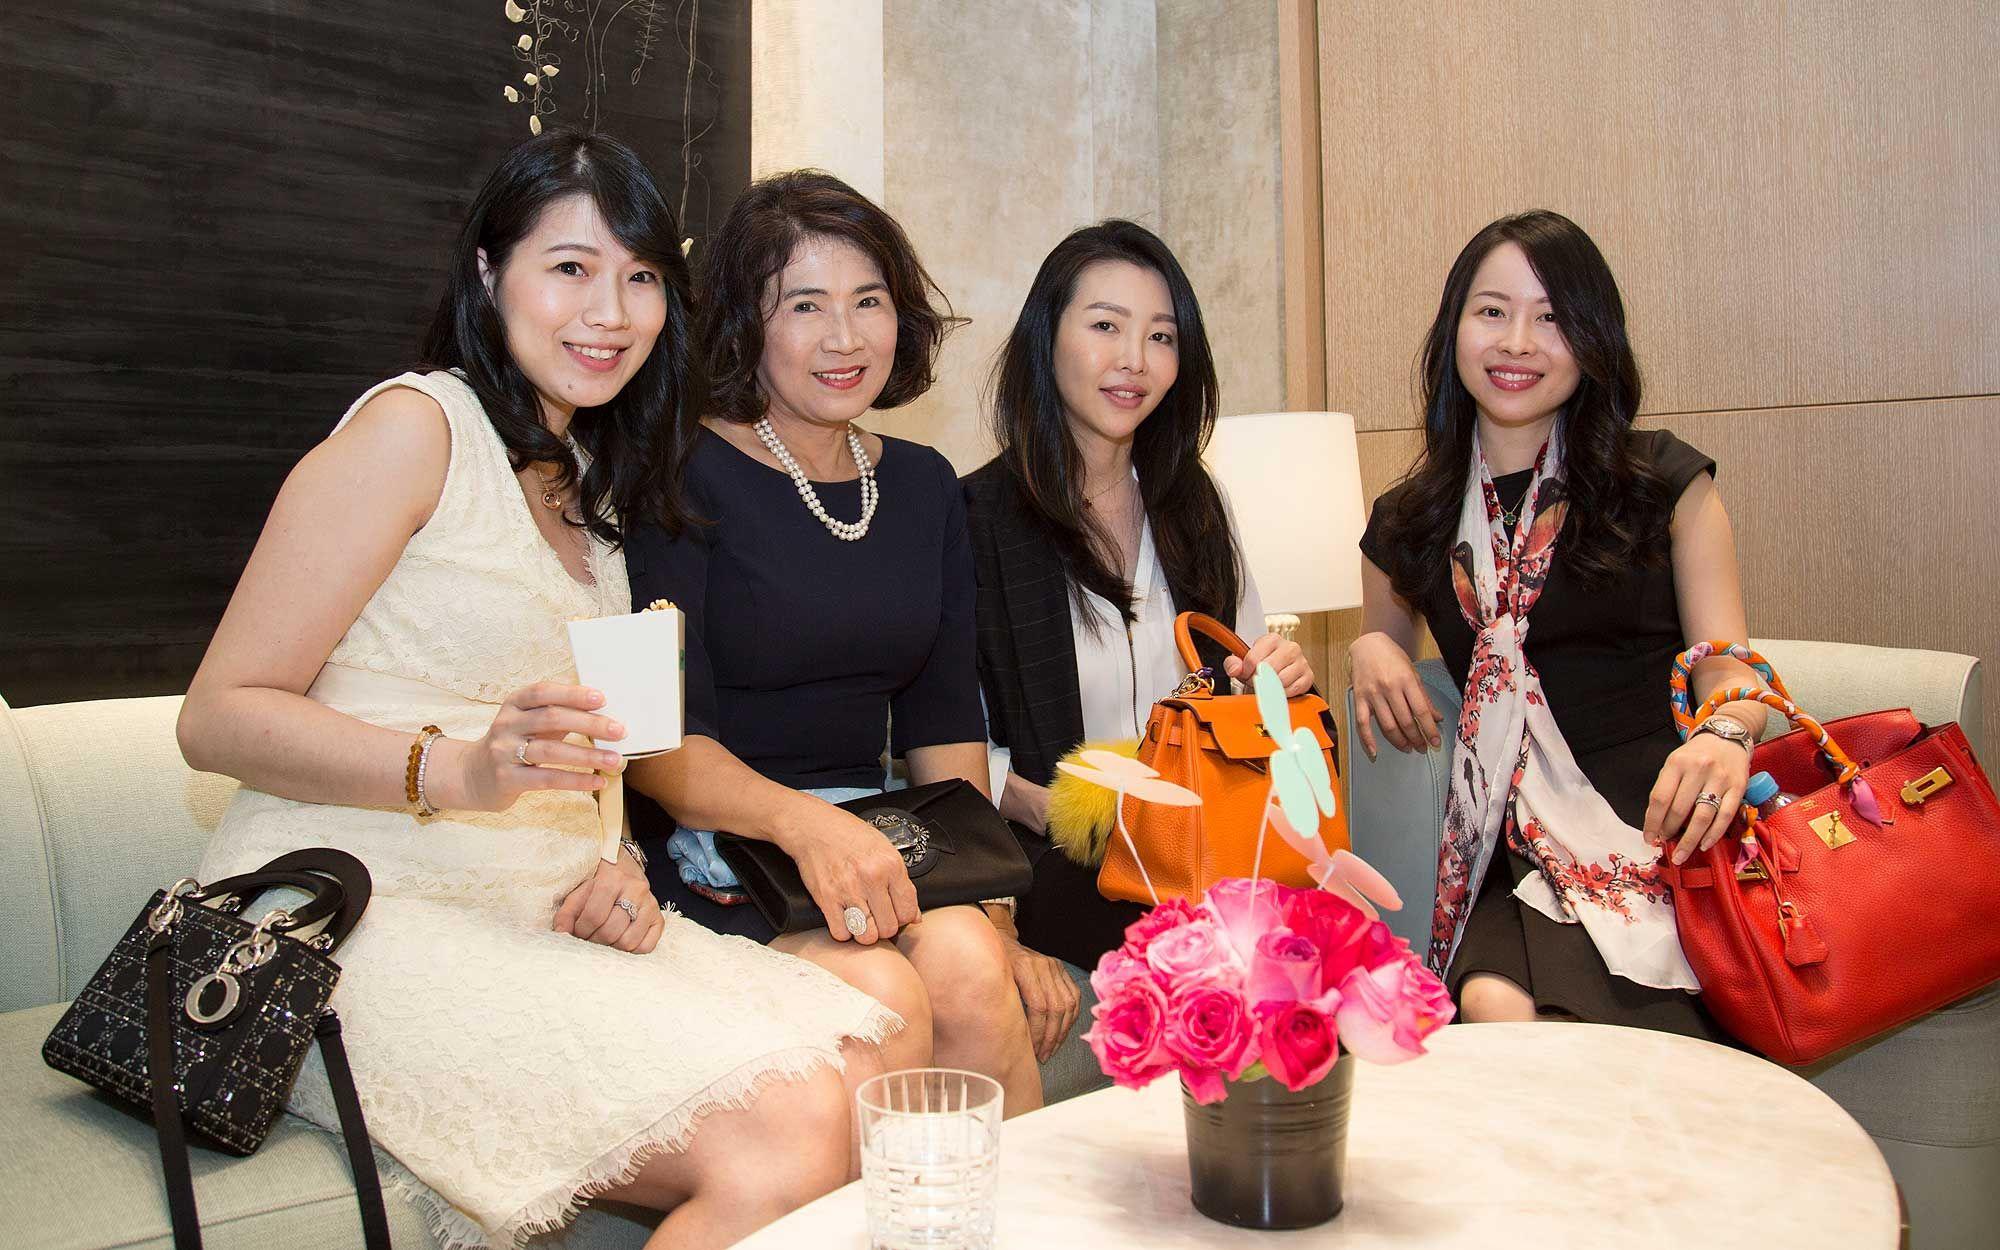 Datin Rosalyn Oei, Grace Huang, Datin Lisa Ong and Caleen Chua